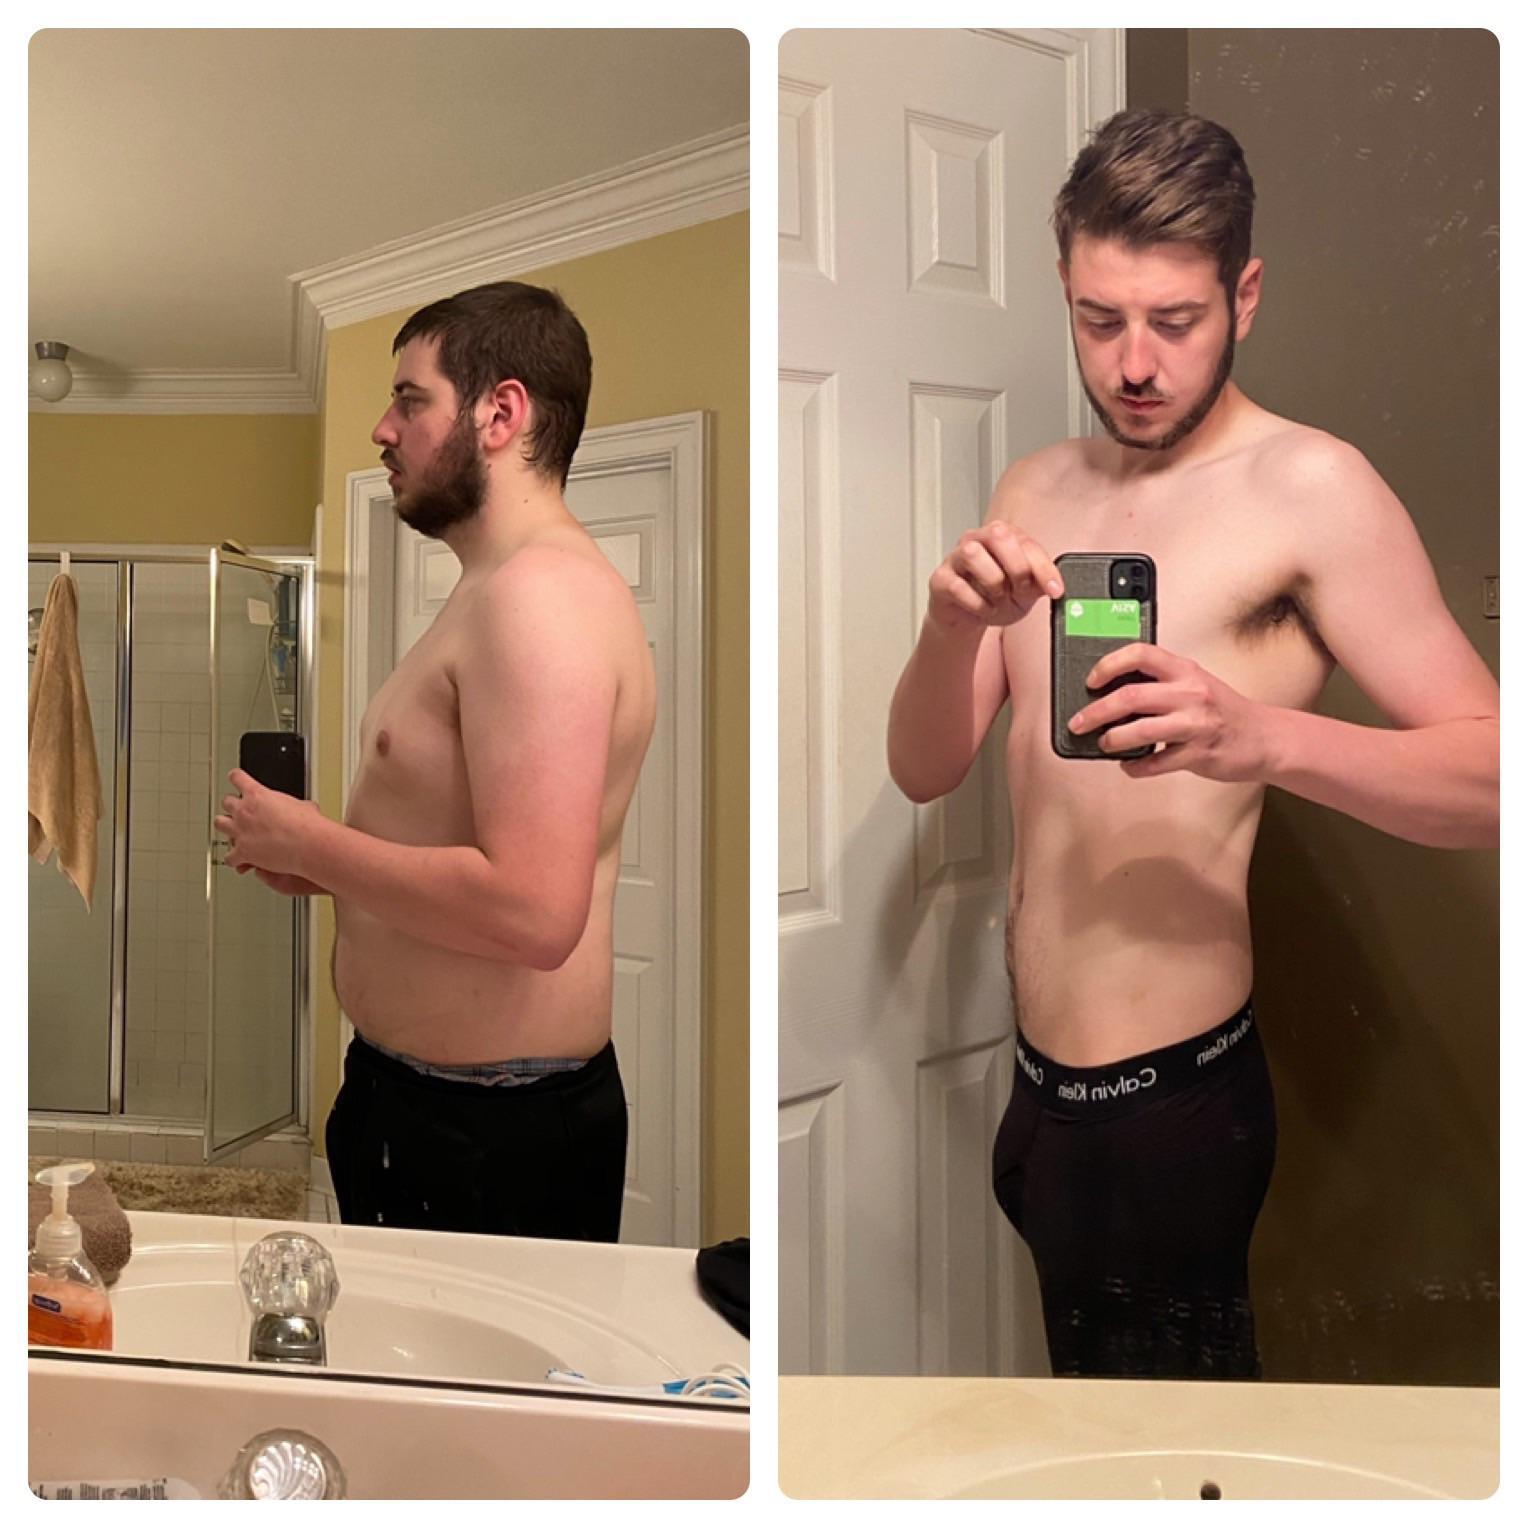 Progress Pics of 65 lbs Weight Loss 6 foot 1 Male 230 lbs to 165 lbs